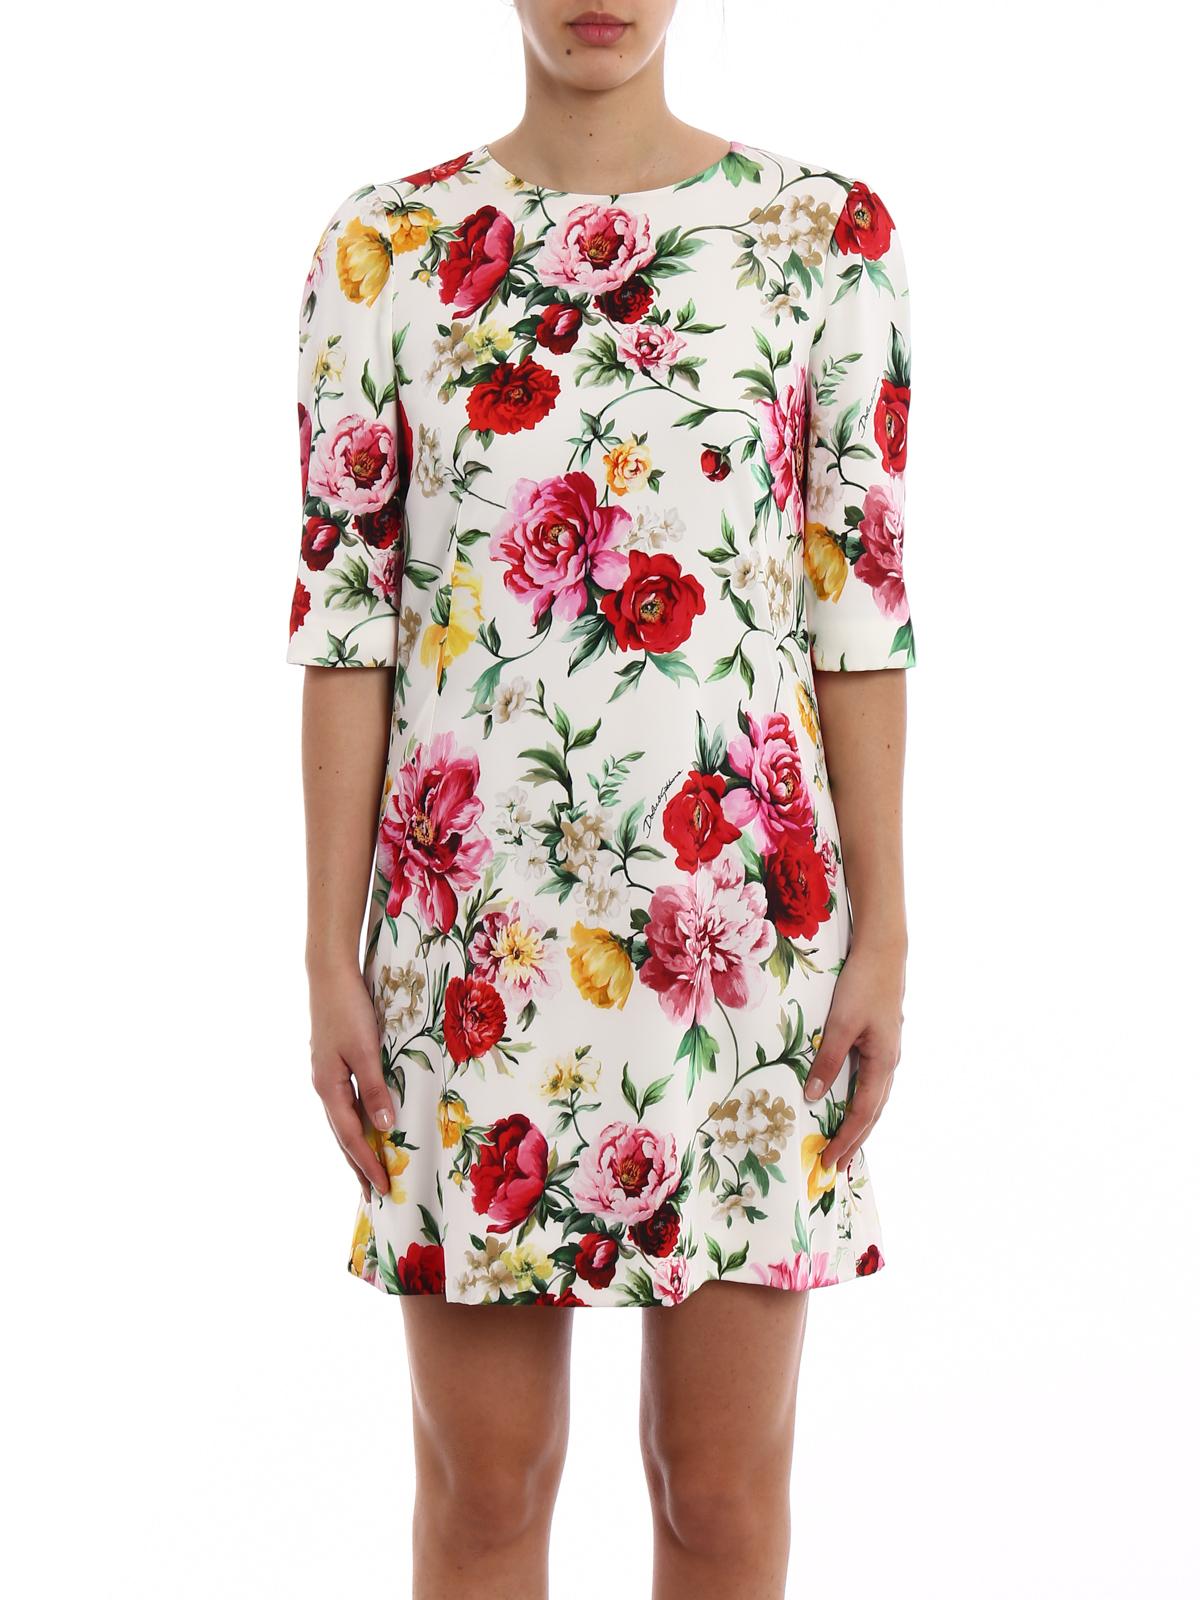 92140f932012db Dolce & Gabbana - Kurzes Kleid - Bunt - Kurze Kleider - F68I7TFSAUGHAM62